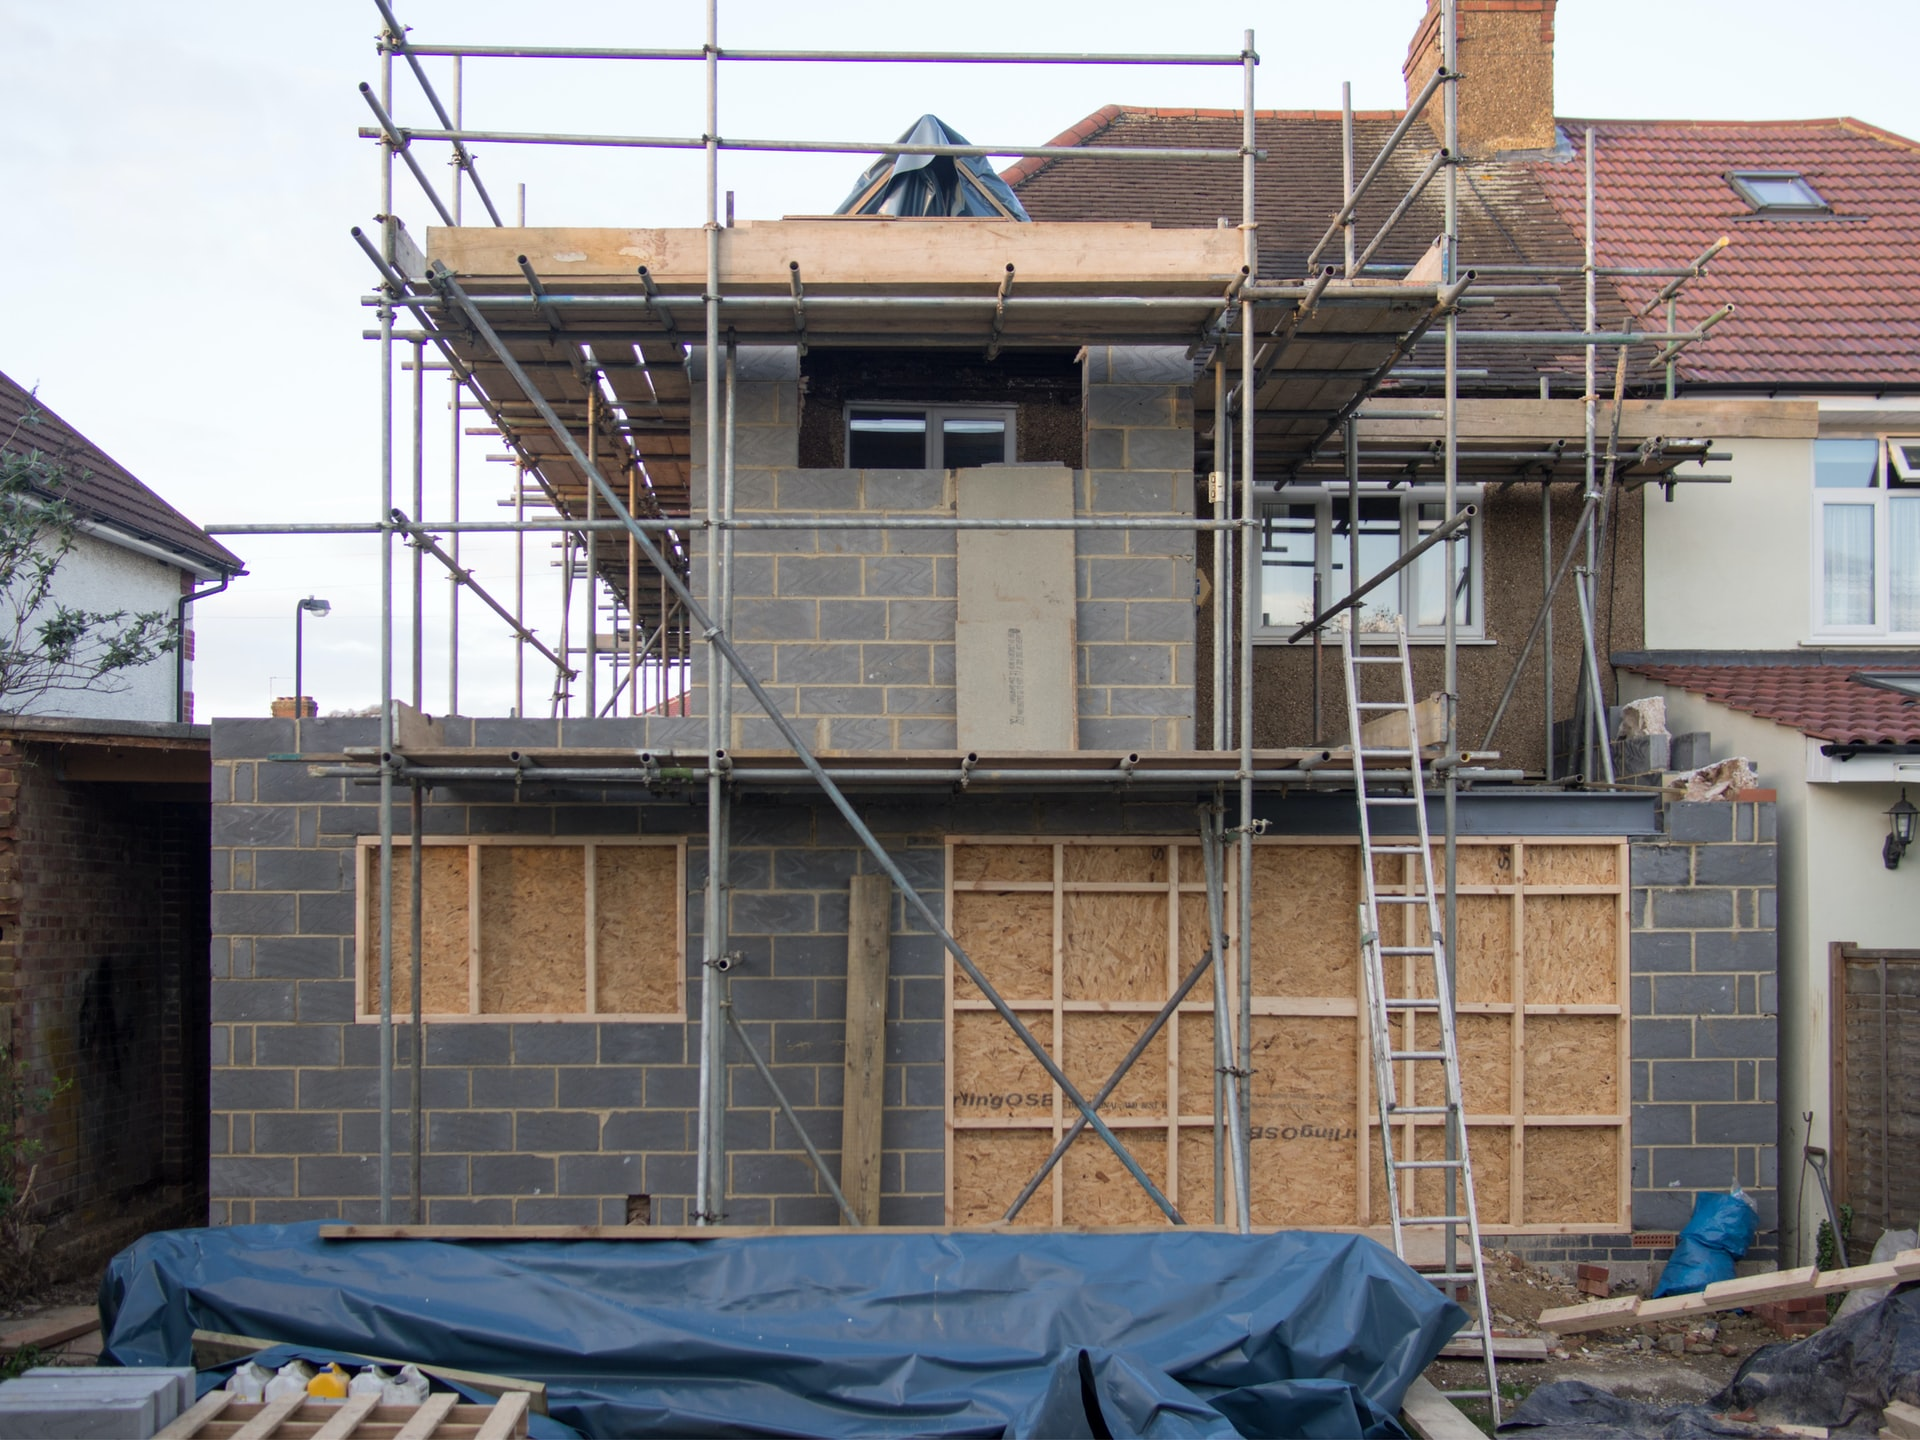 bouwovertreding regulariseren